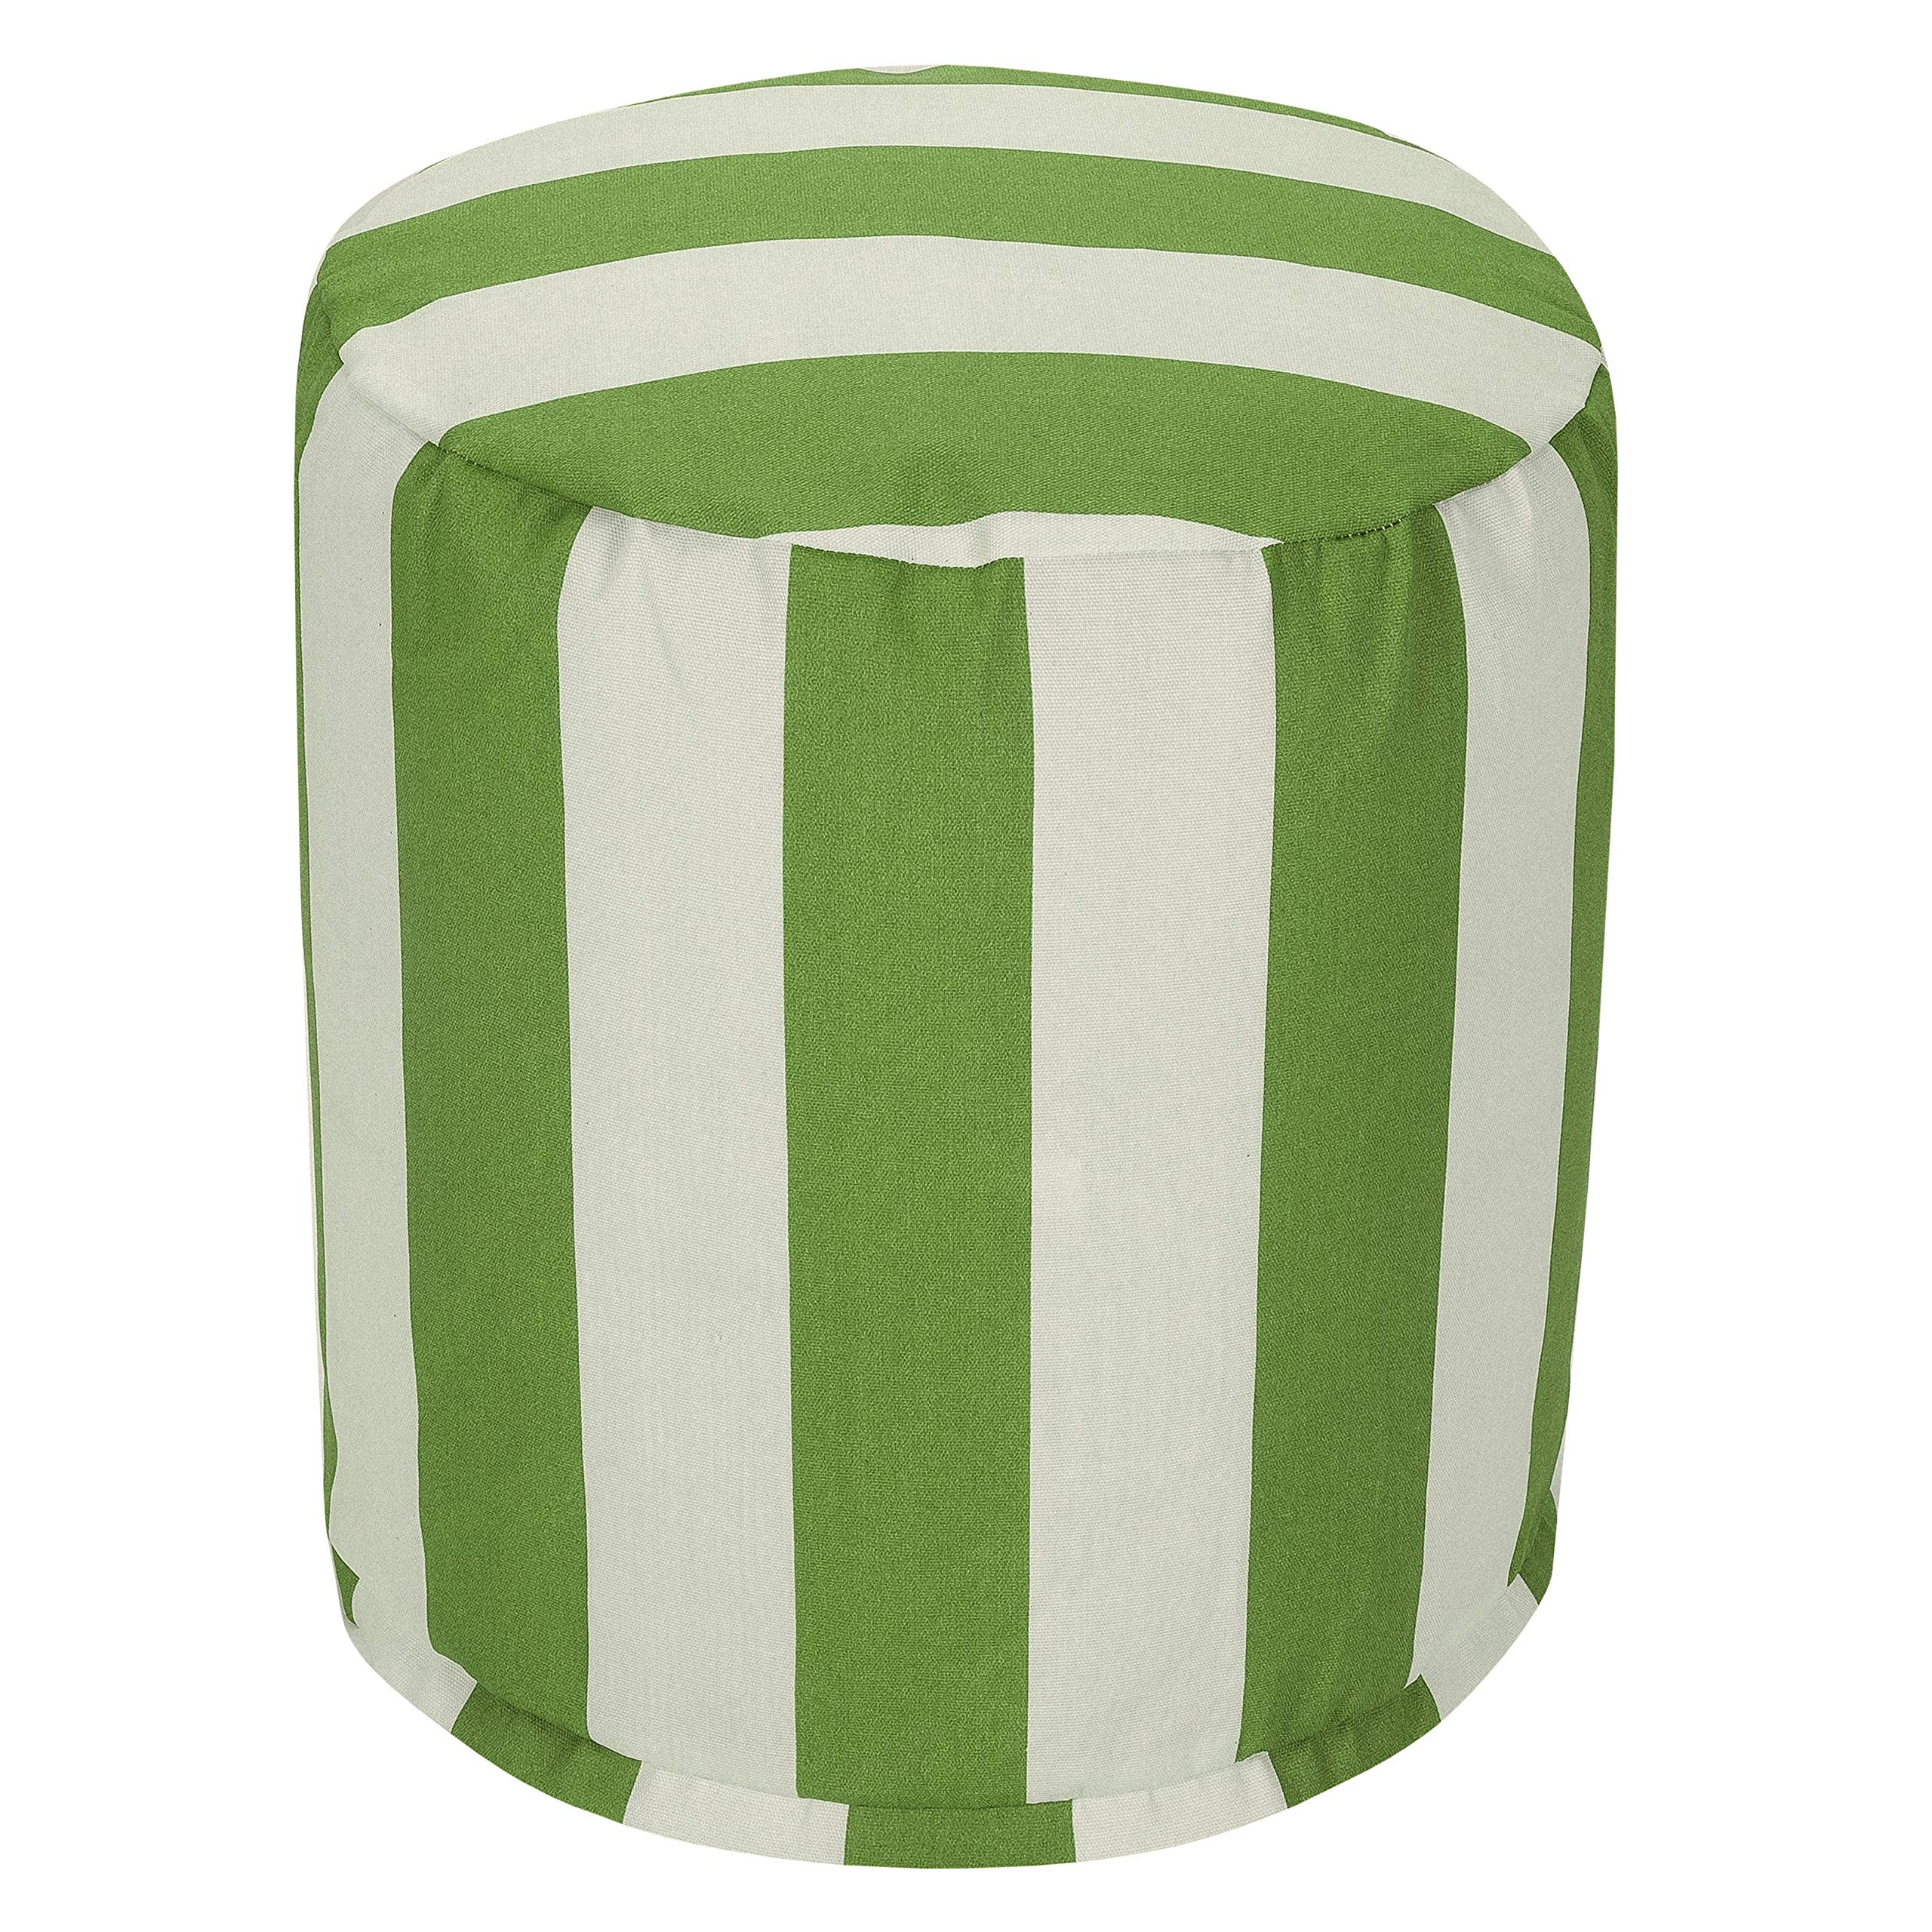 Majestic Home Goods Sage Vertical Stripe Indoor/Outdoor Bean Bag Ottoman Pouf 16'' L x 16'' W x 17'' H